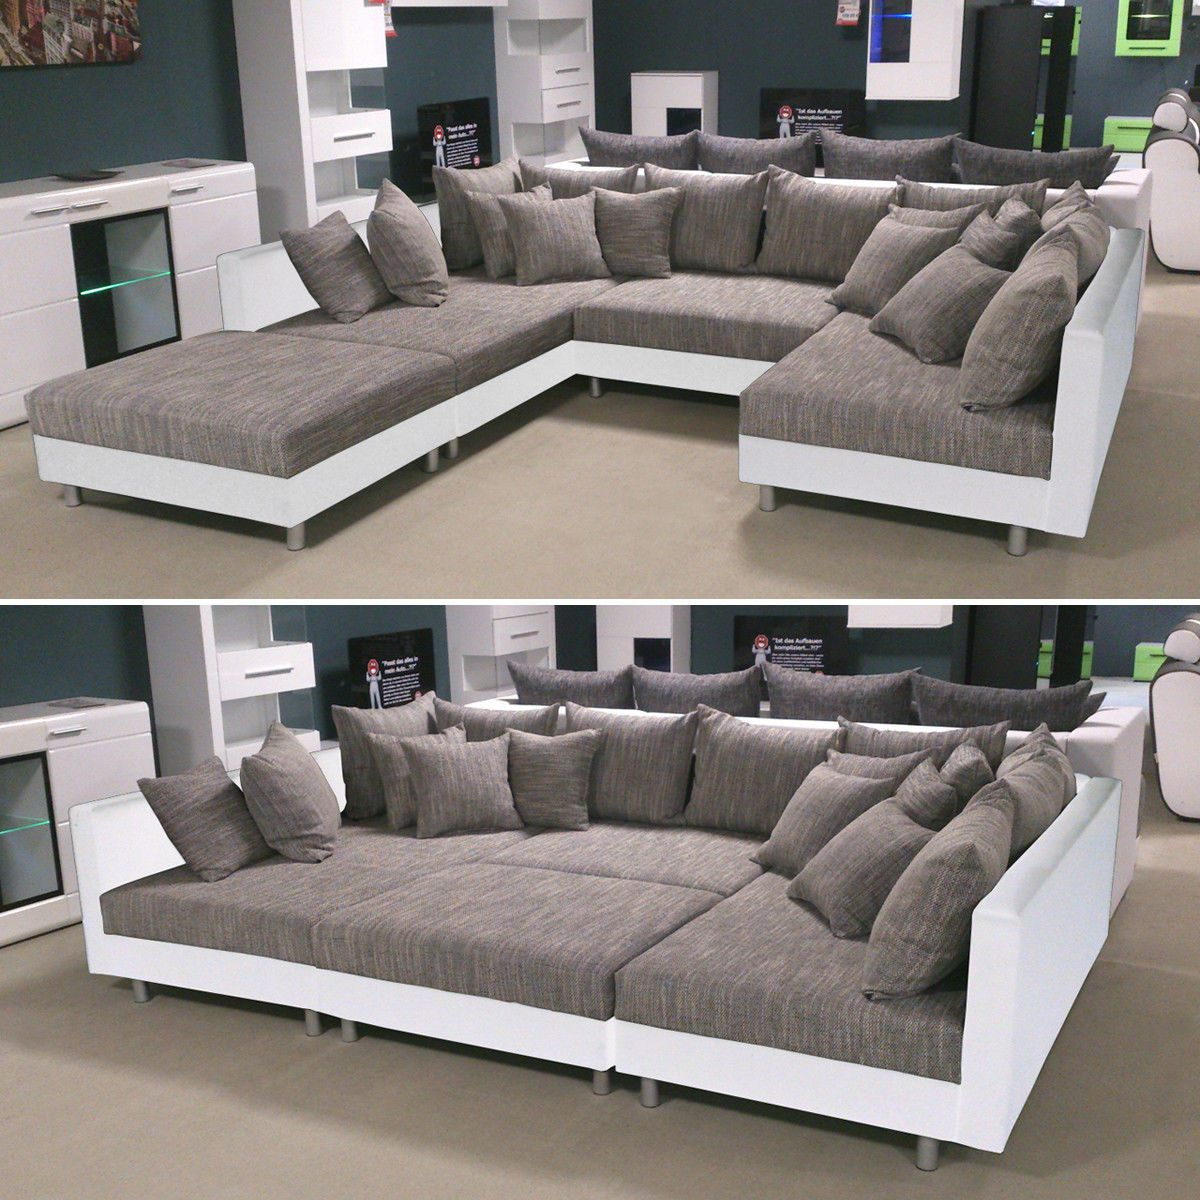 32++ Bedroom sofa set xxl ppdb 2021